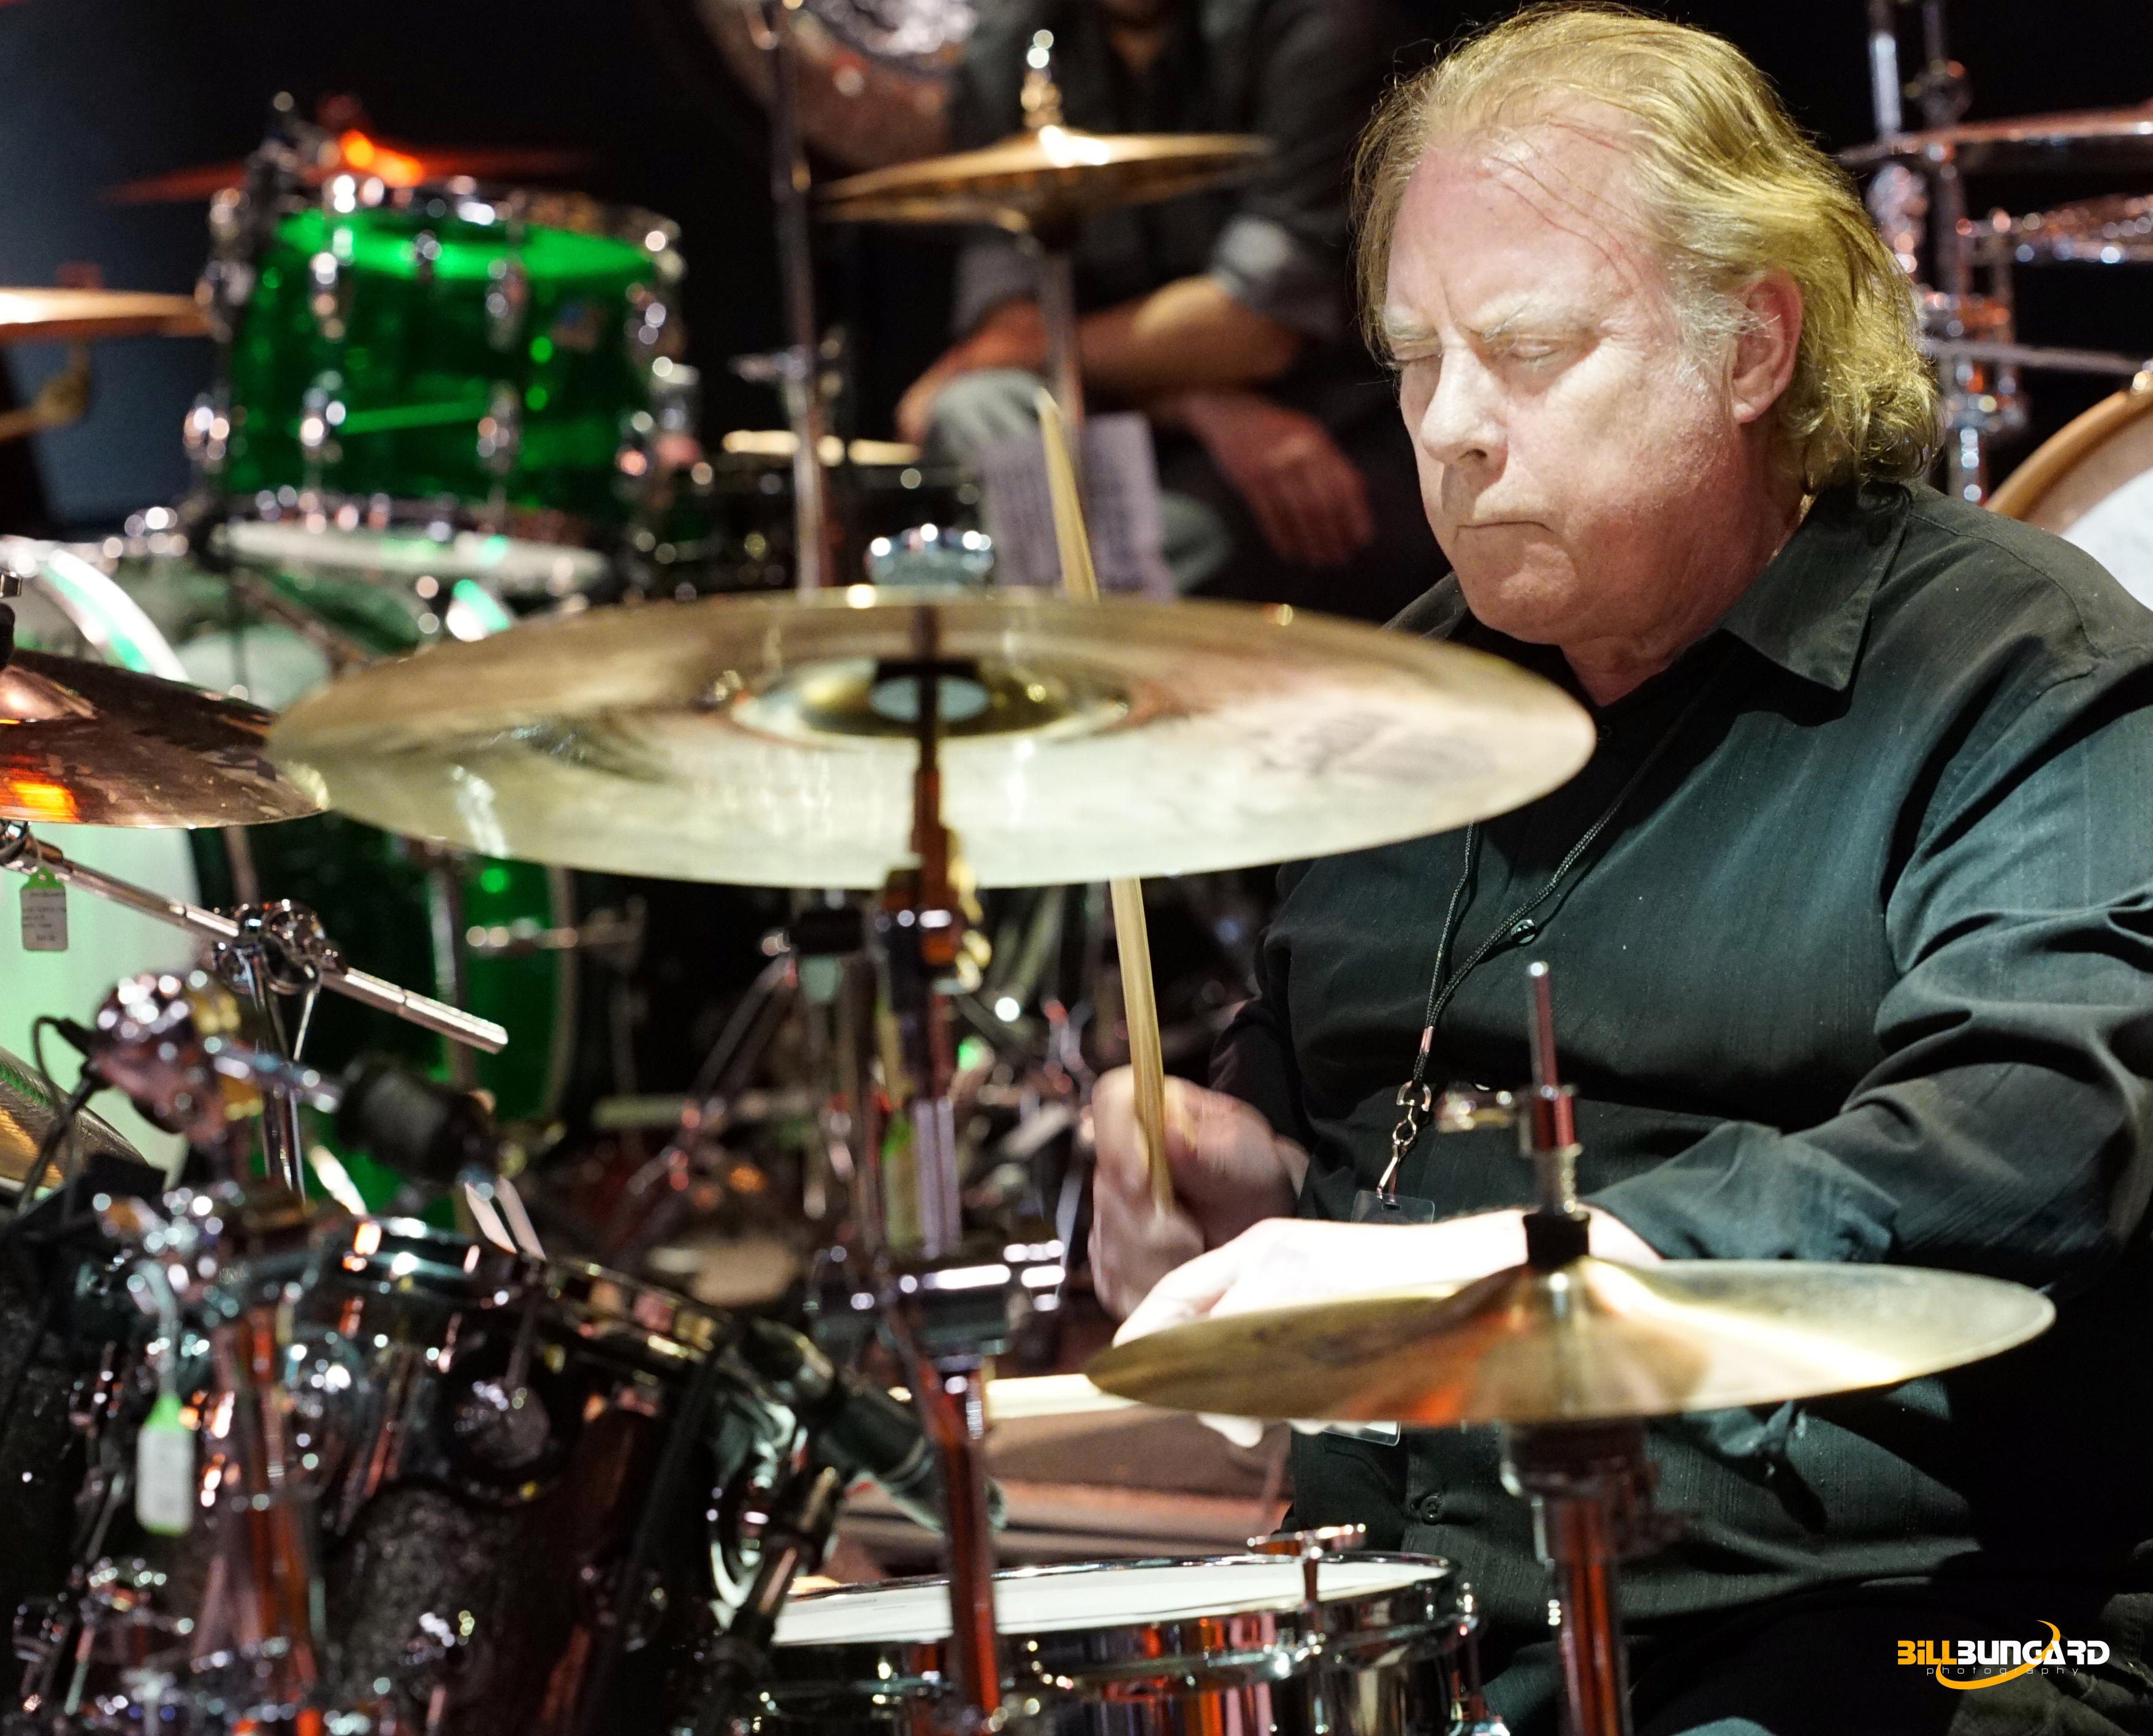 Michael Shrieve of Santana at Woodstick 2015 (Photo by Bill Bungard)